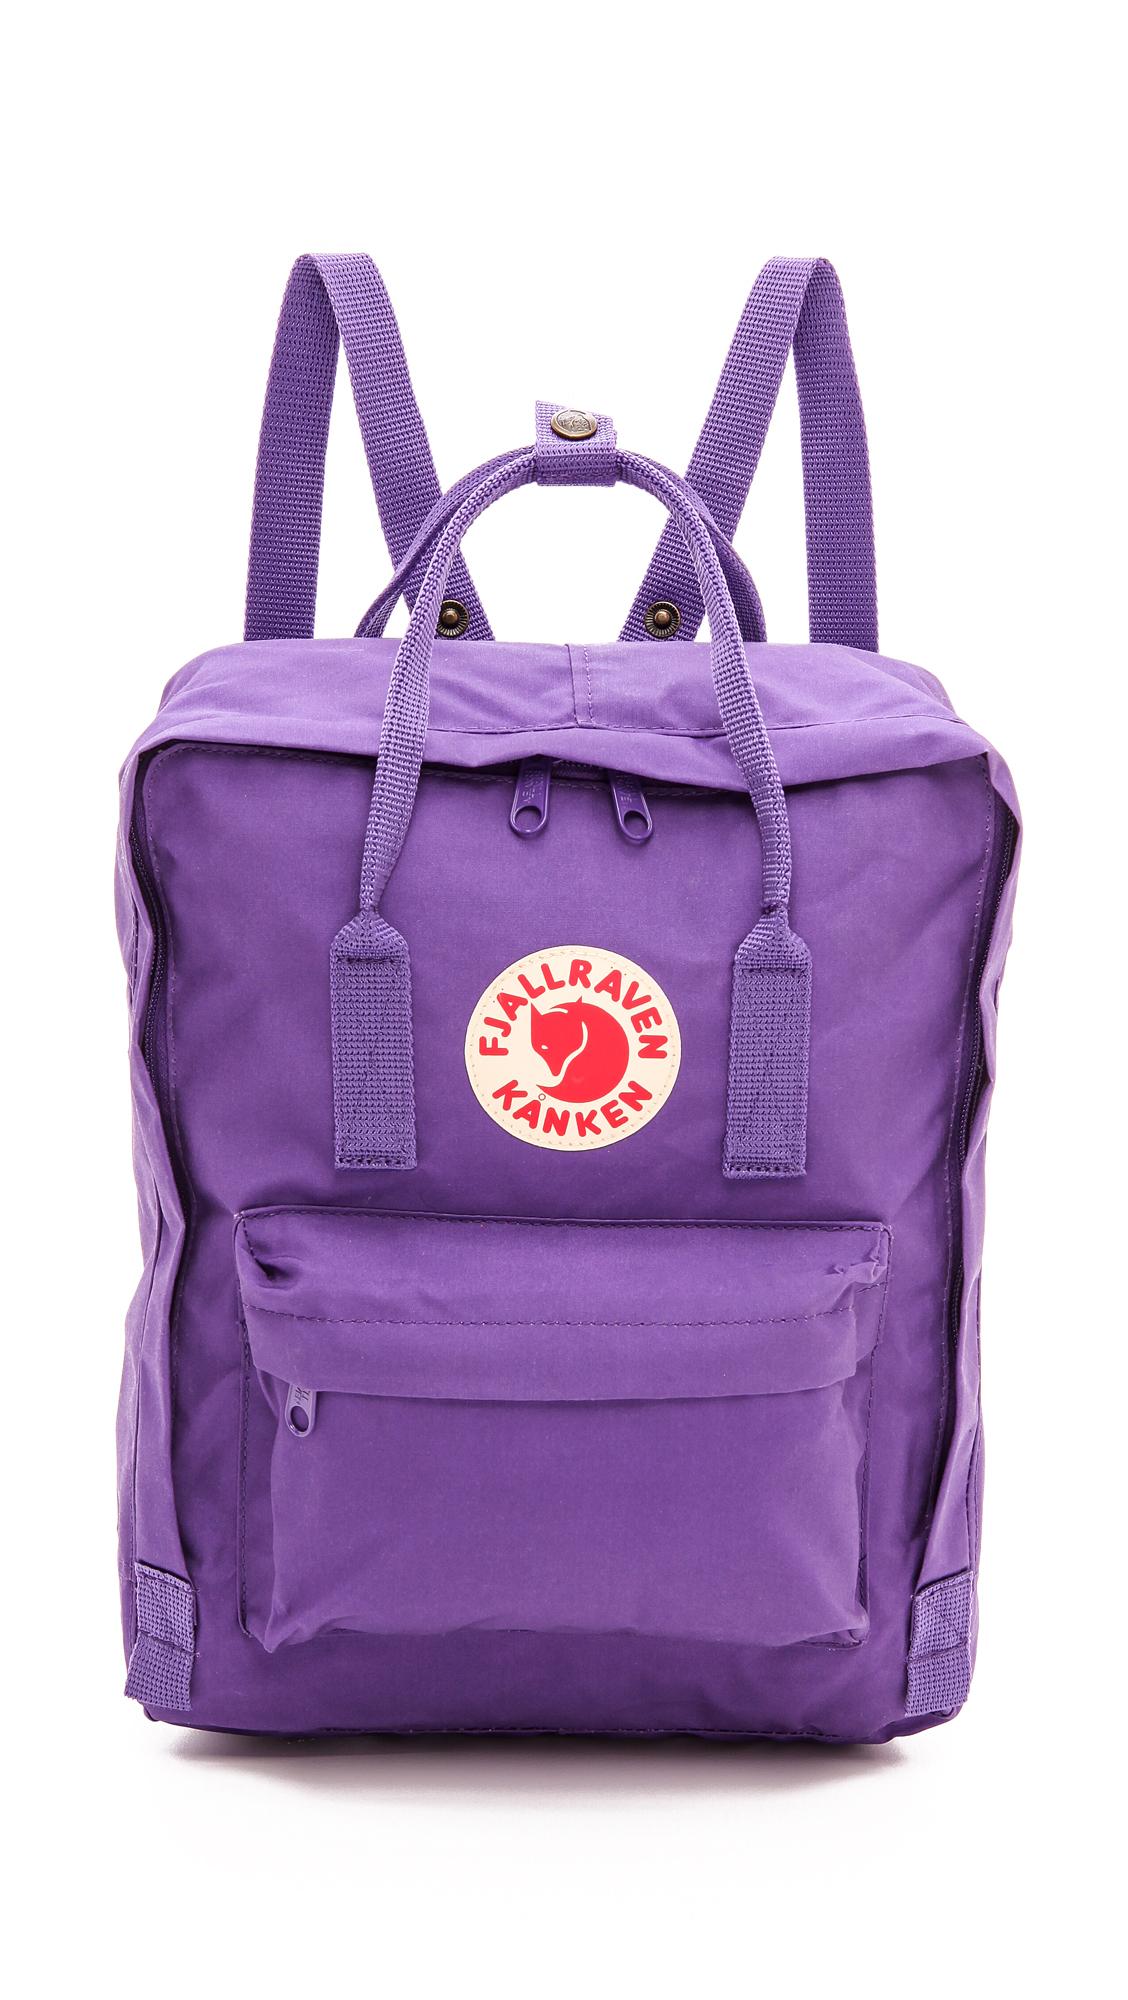 Fjallraven Kanken Backpack - Black Graphite in Purple - Lyst 16eaac1ad0304